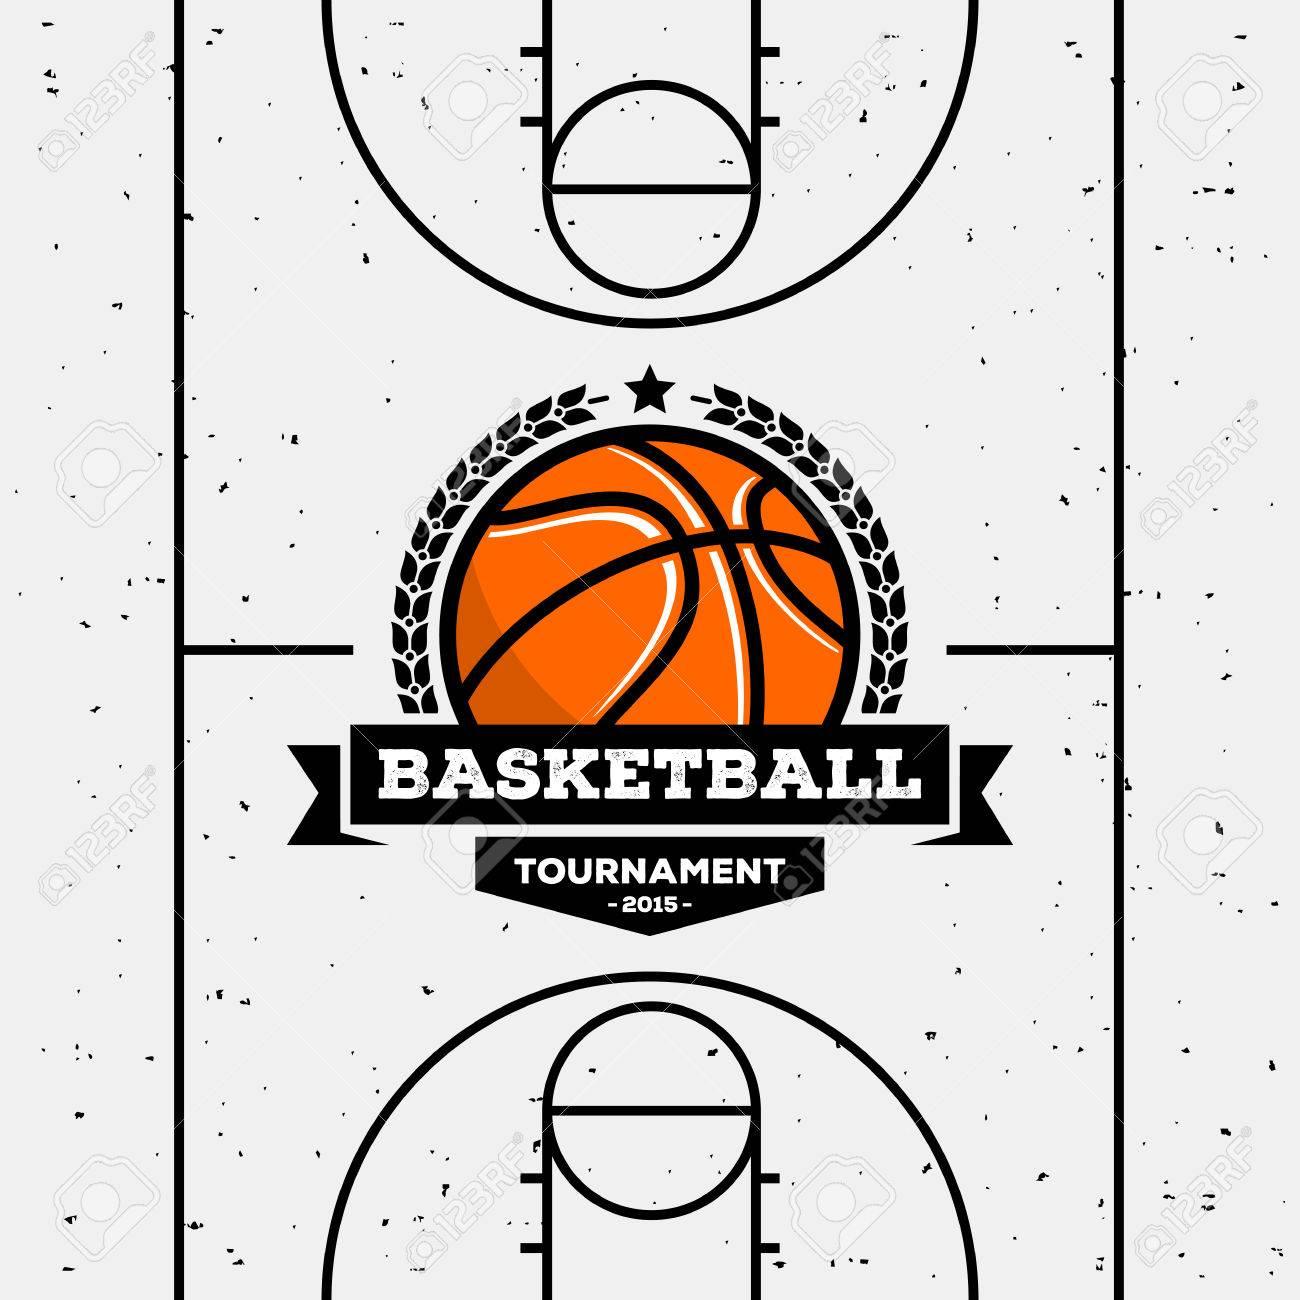 Fein Basketball Turnier Klammer Vorlage Ideen - Entry Level Resume ...